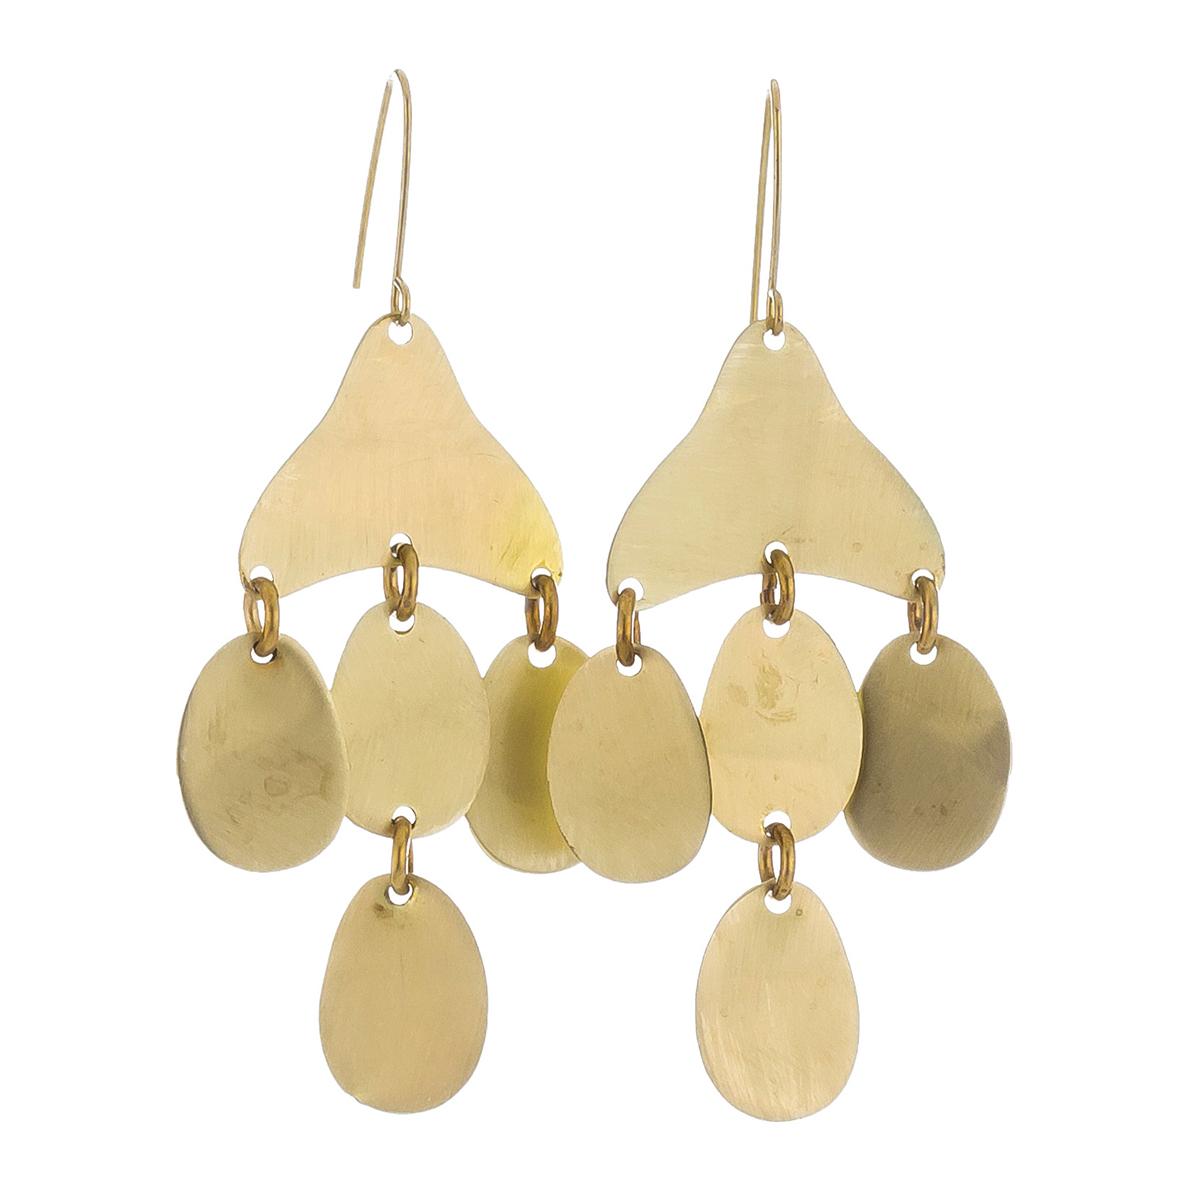 Brass Medusa earrings by Sibilia